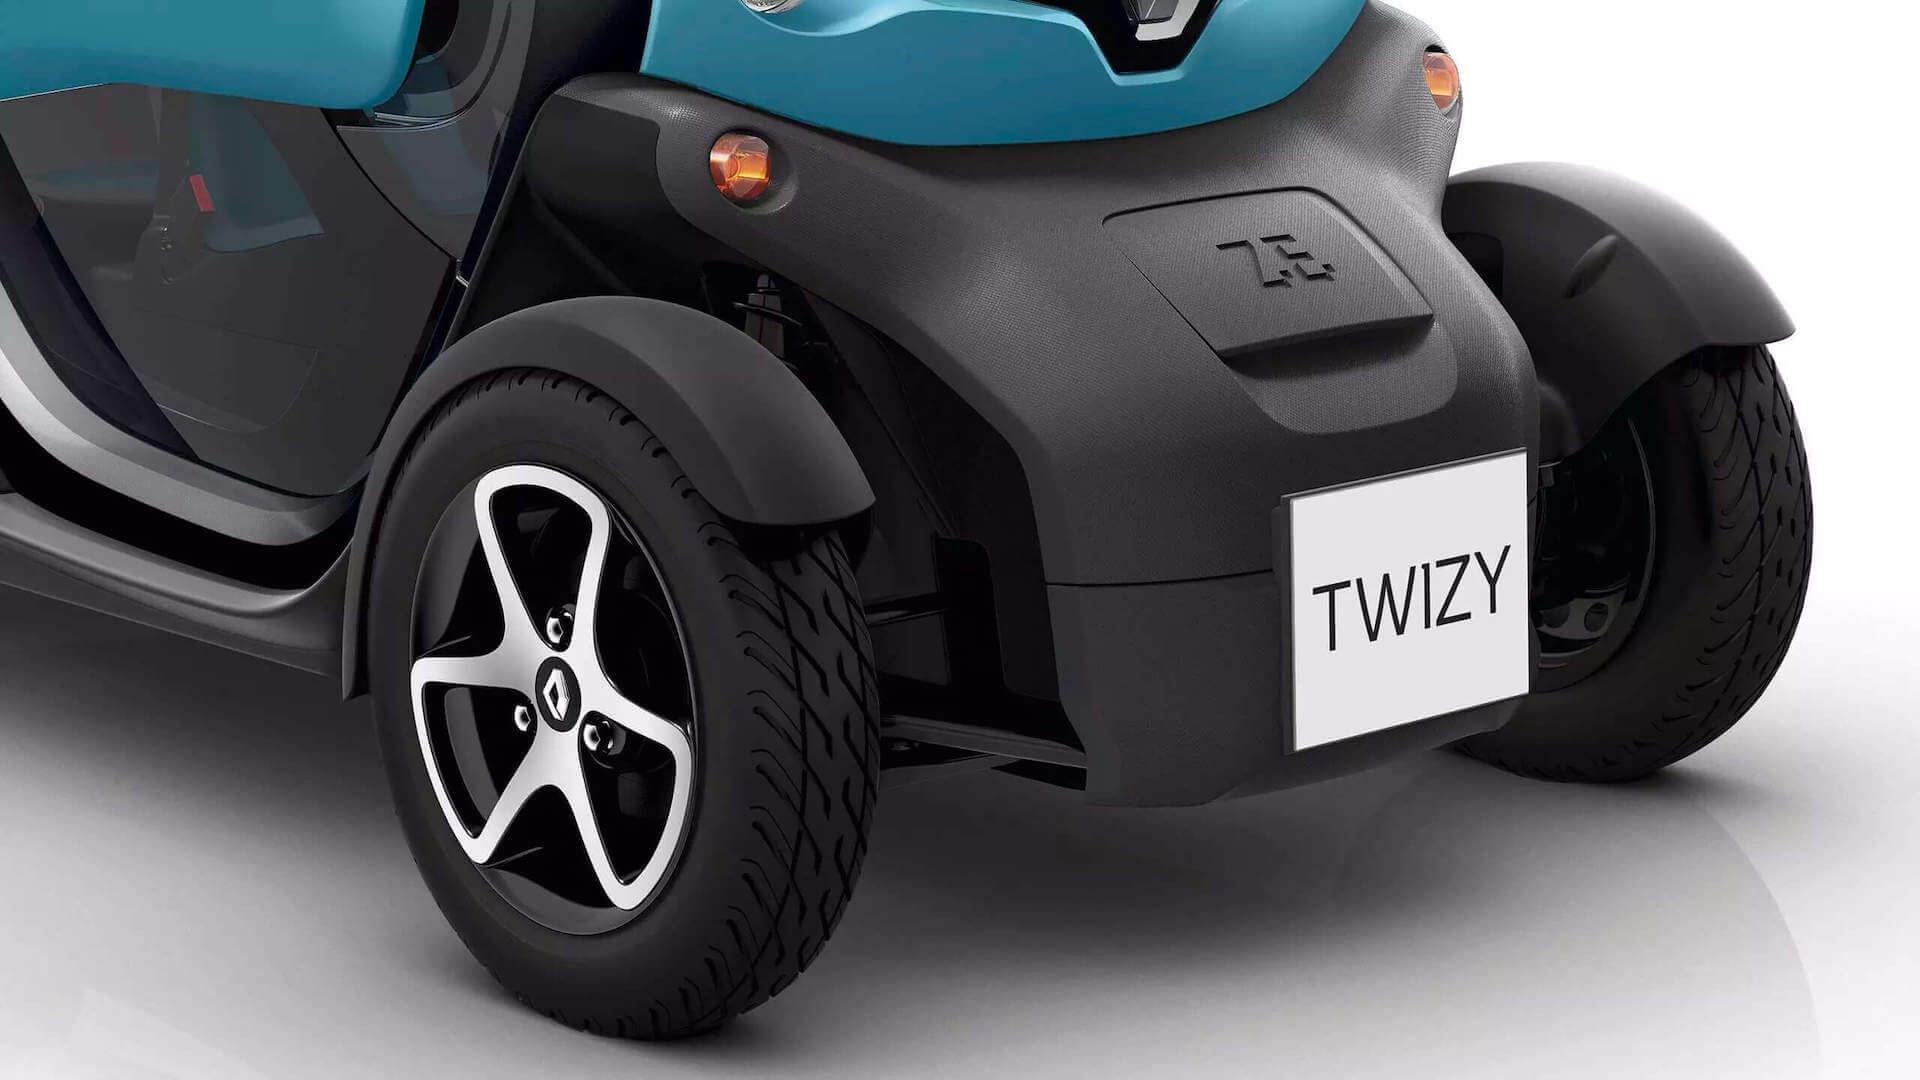 Raddesign vom Auto - Renault Twizy - Renault Ahrens Hannover